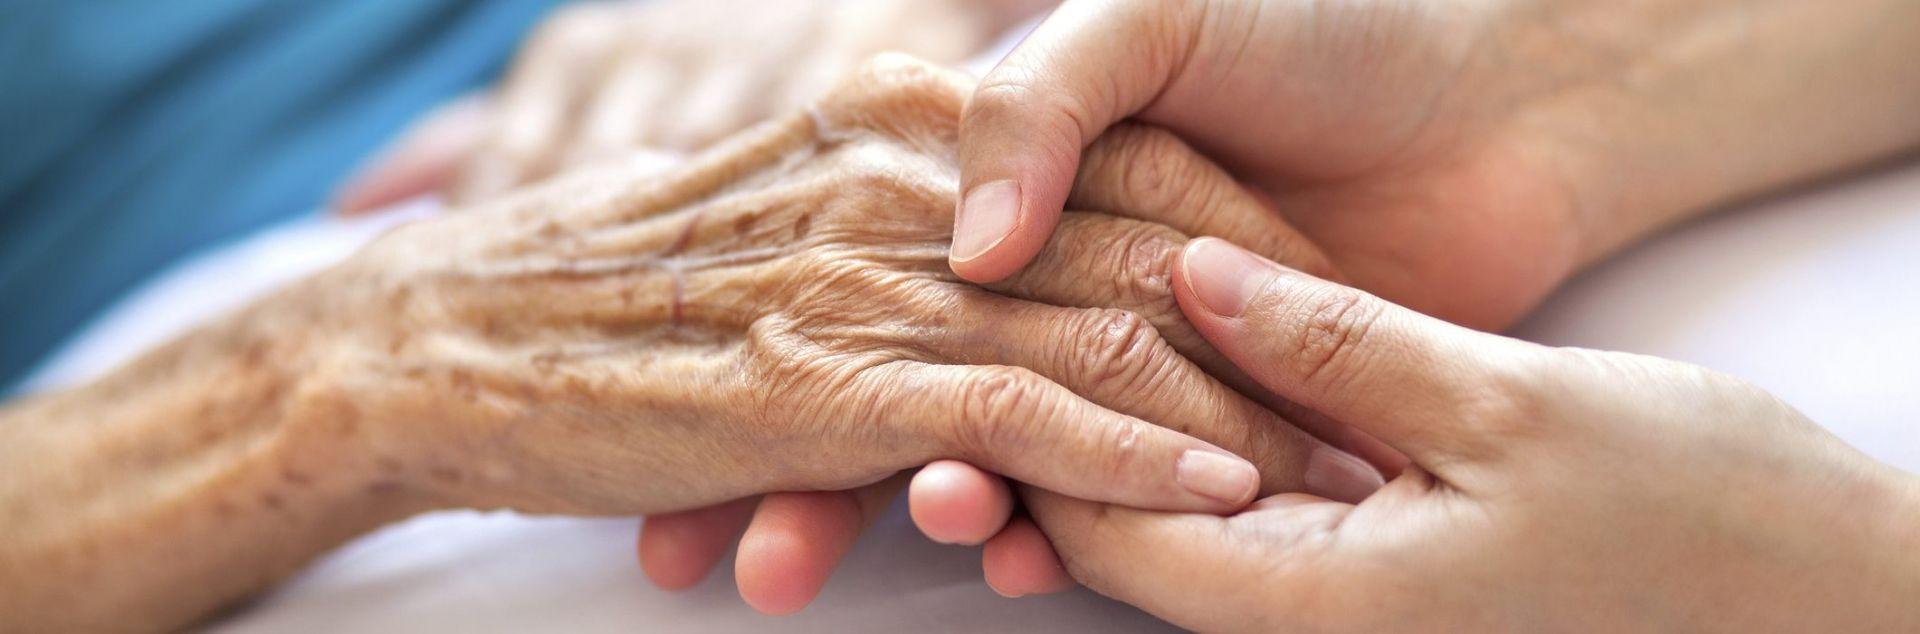 Holding-hands-image-2121x700.jpg